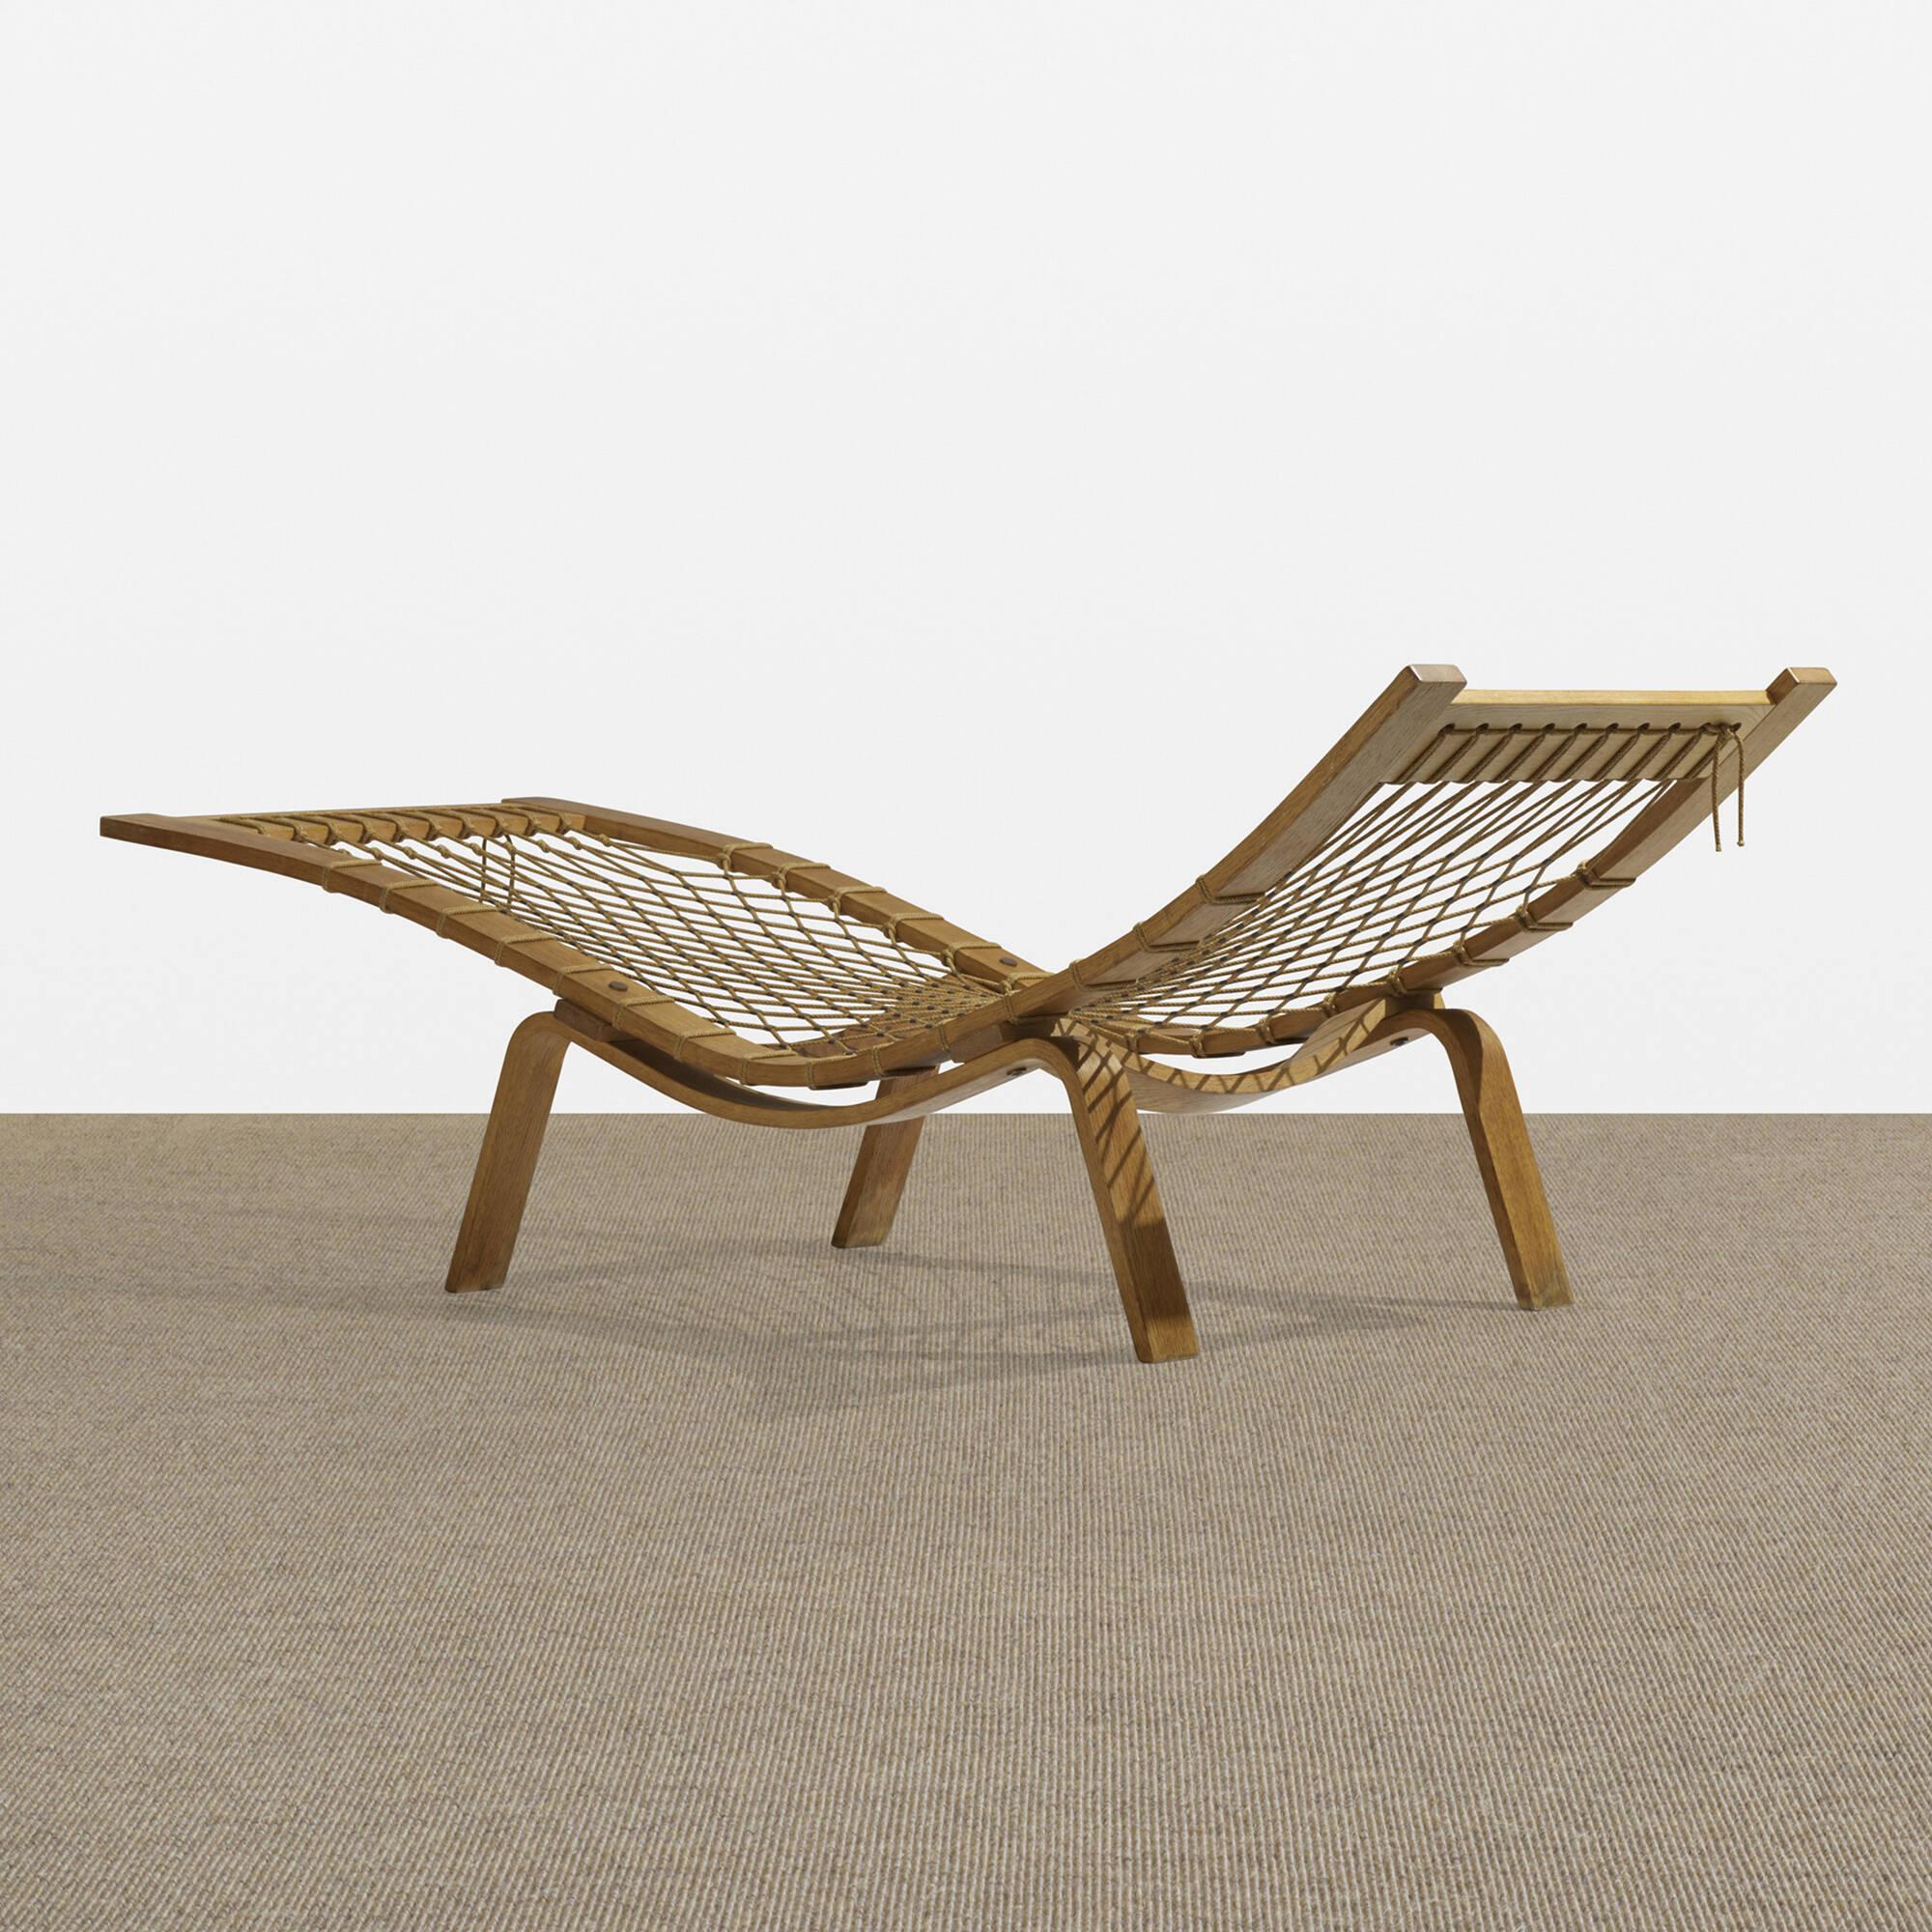 165: Hans J. Wegner / Hammock chaise (1 of 5)